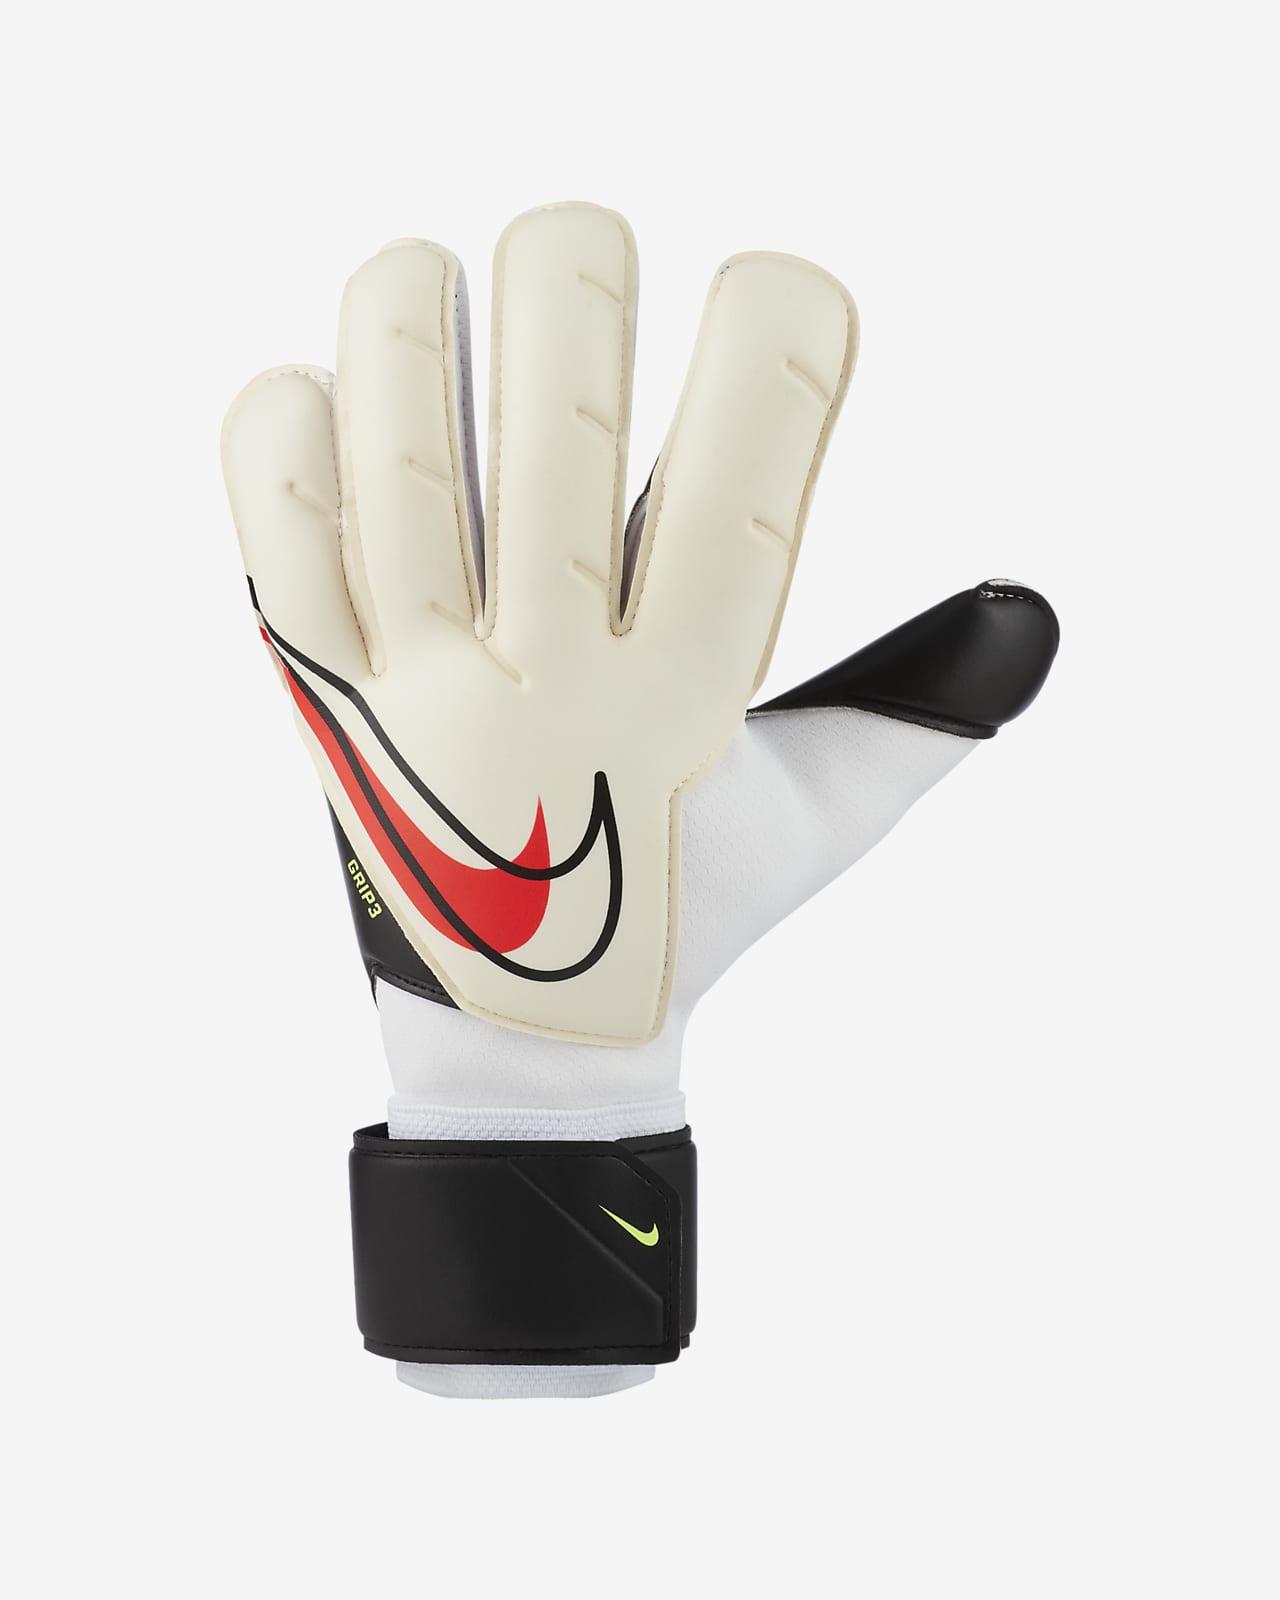 Gants de football Nike Gardien de but Grip3